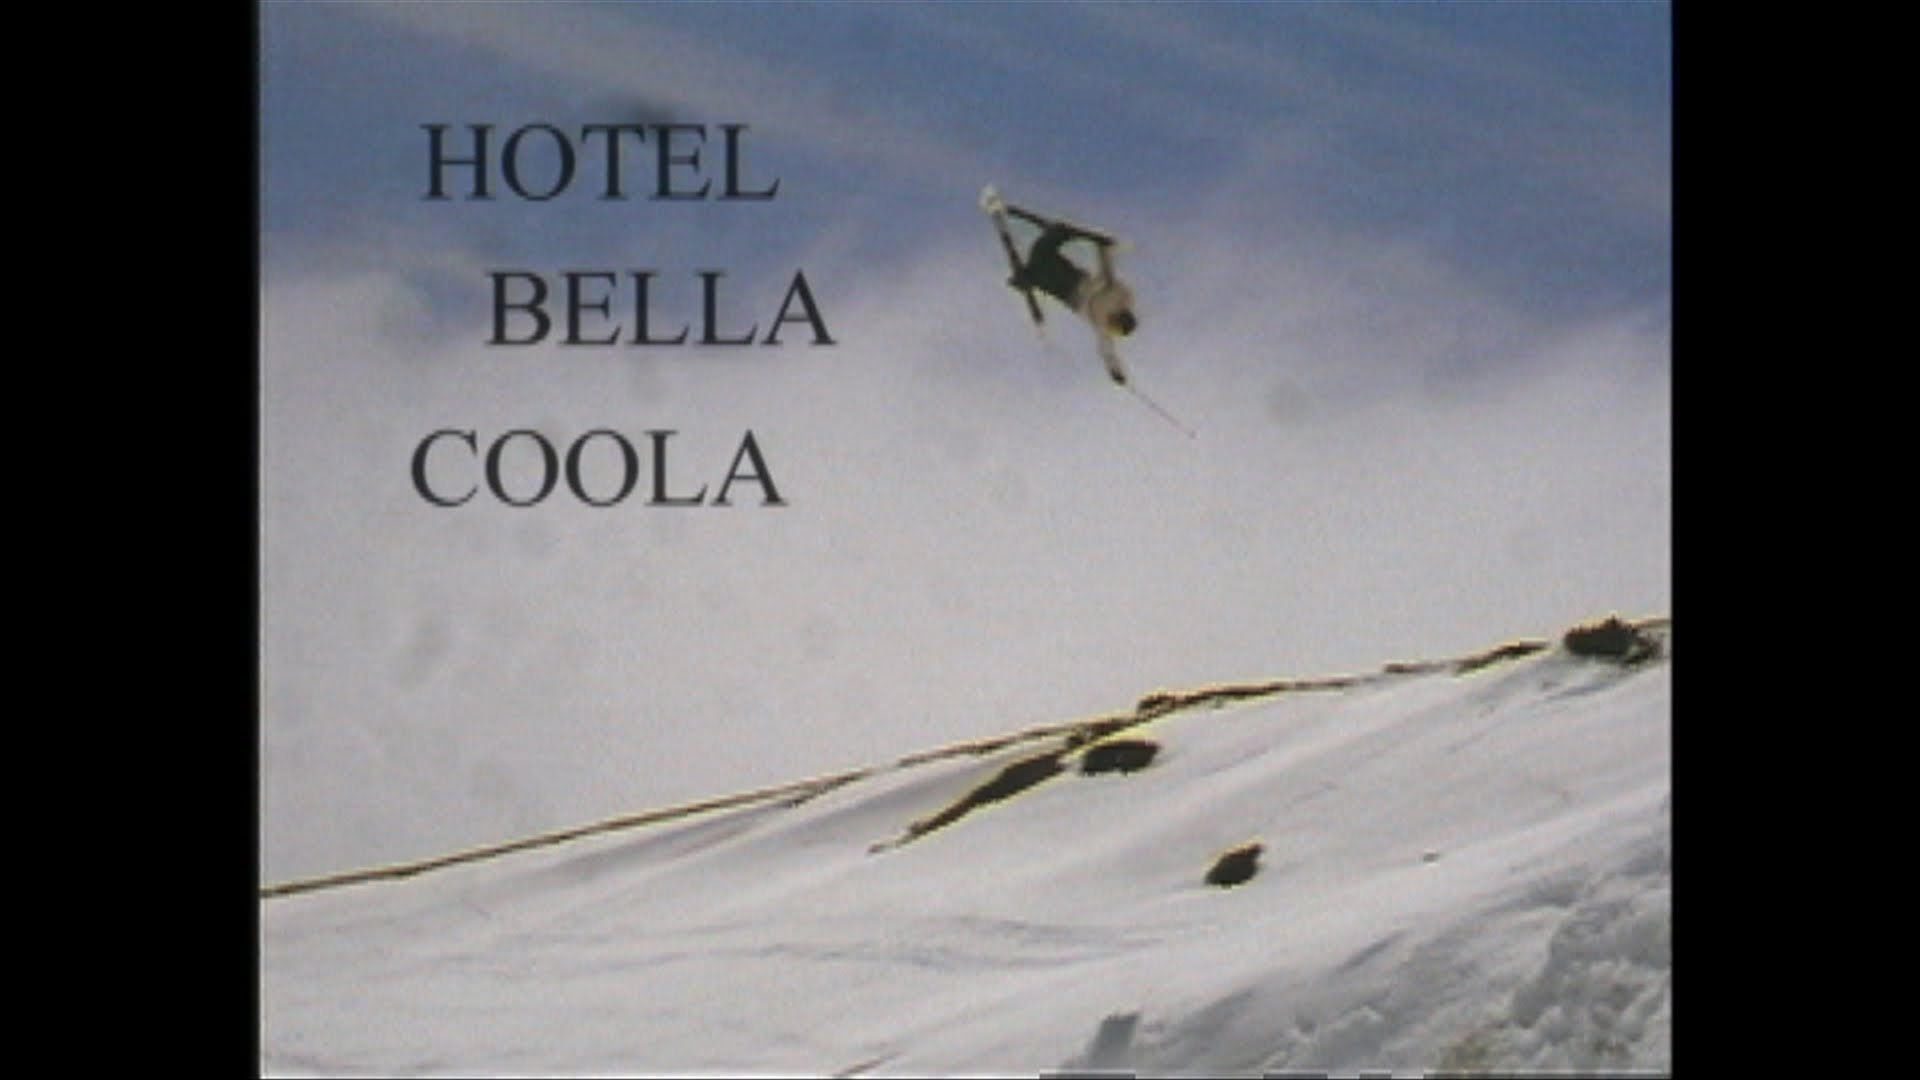 Hotel Bella Coola